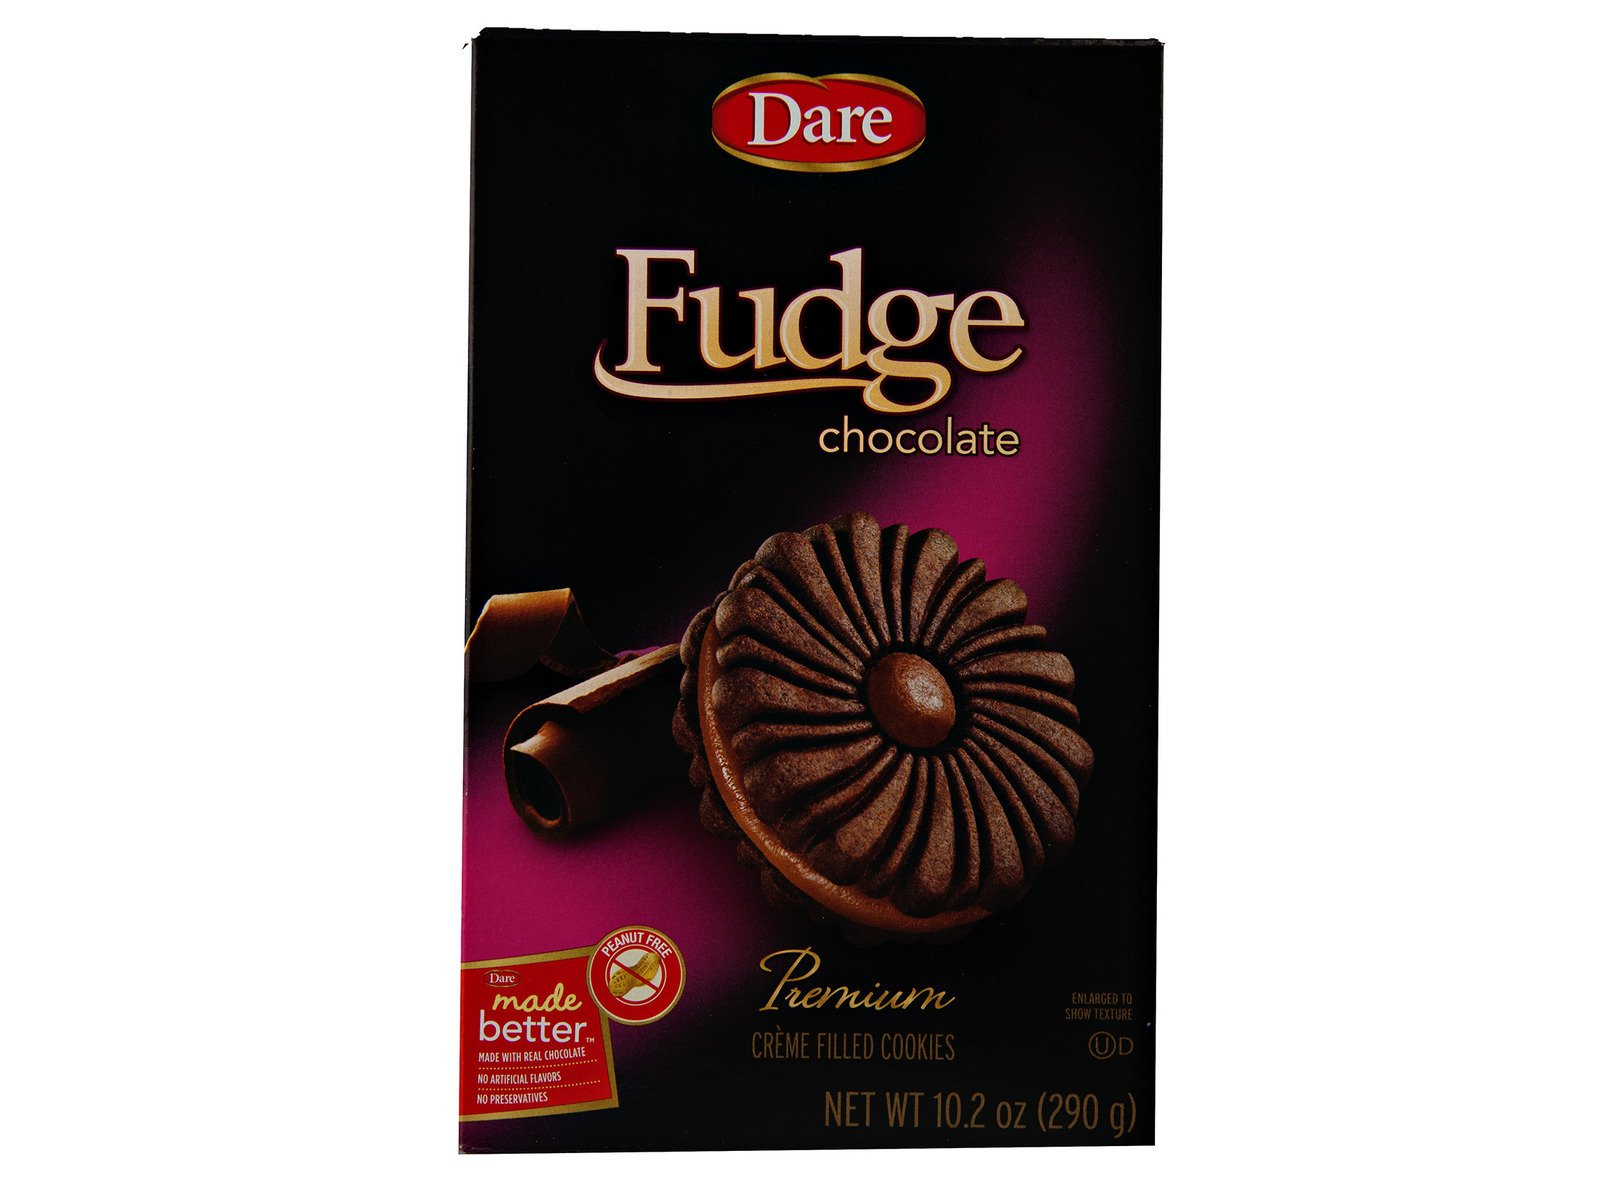 Dare Foods Fudge Chocolate Creme Cookies 3 /10.2 oz Boxes by YANKEETRADERS